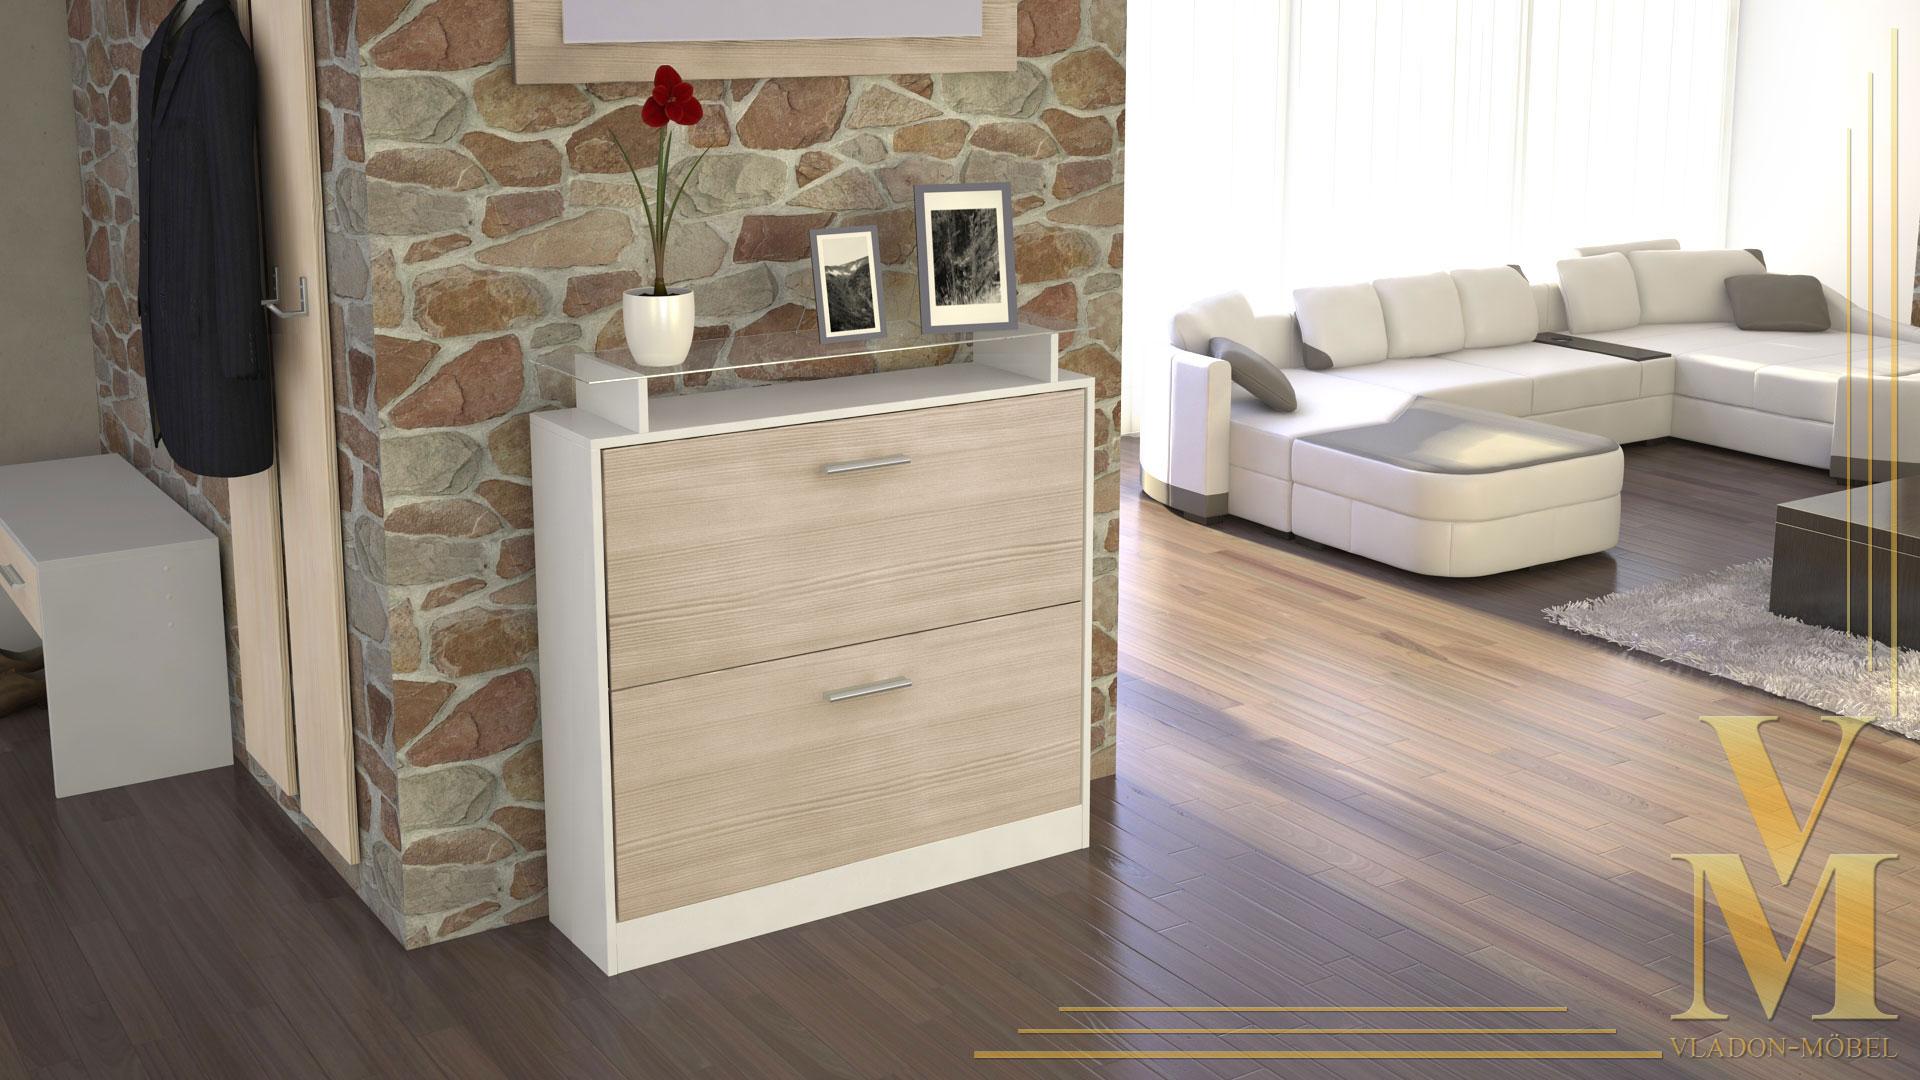 schuhschrank schuhkipper dielen flur schrank roma wei hochglanz naturt ne ebay. Black Bedroom Furniture Sets. Home Design Ideas